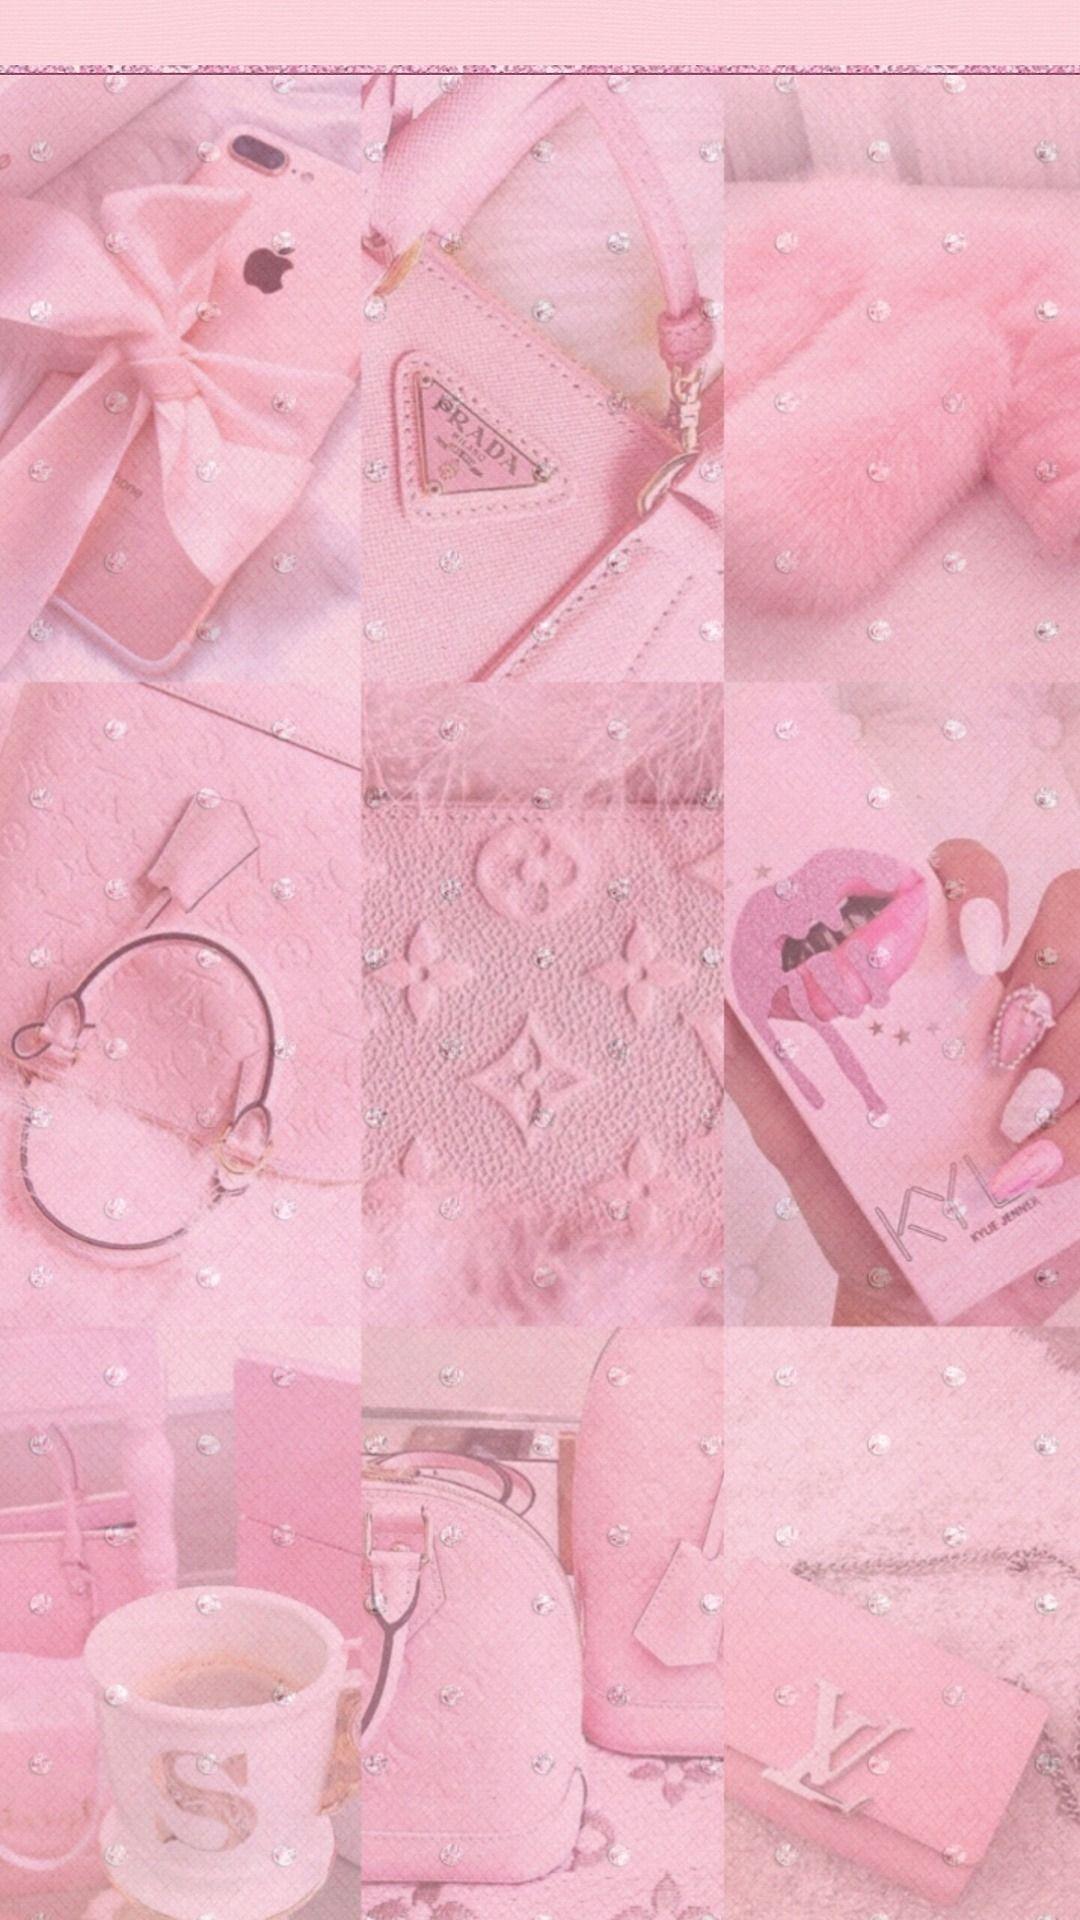 WALLPAPERS — Pink wallpapers in 2020 | Pink wallpaper ...